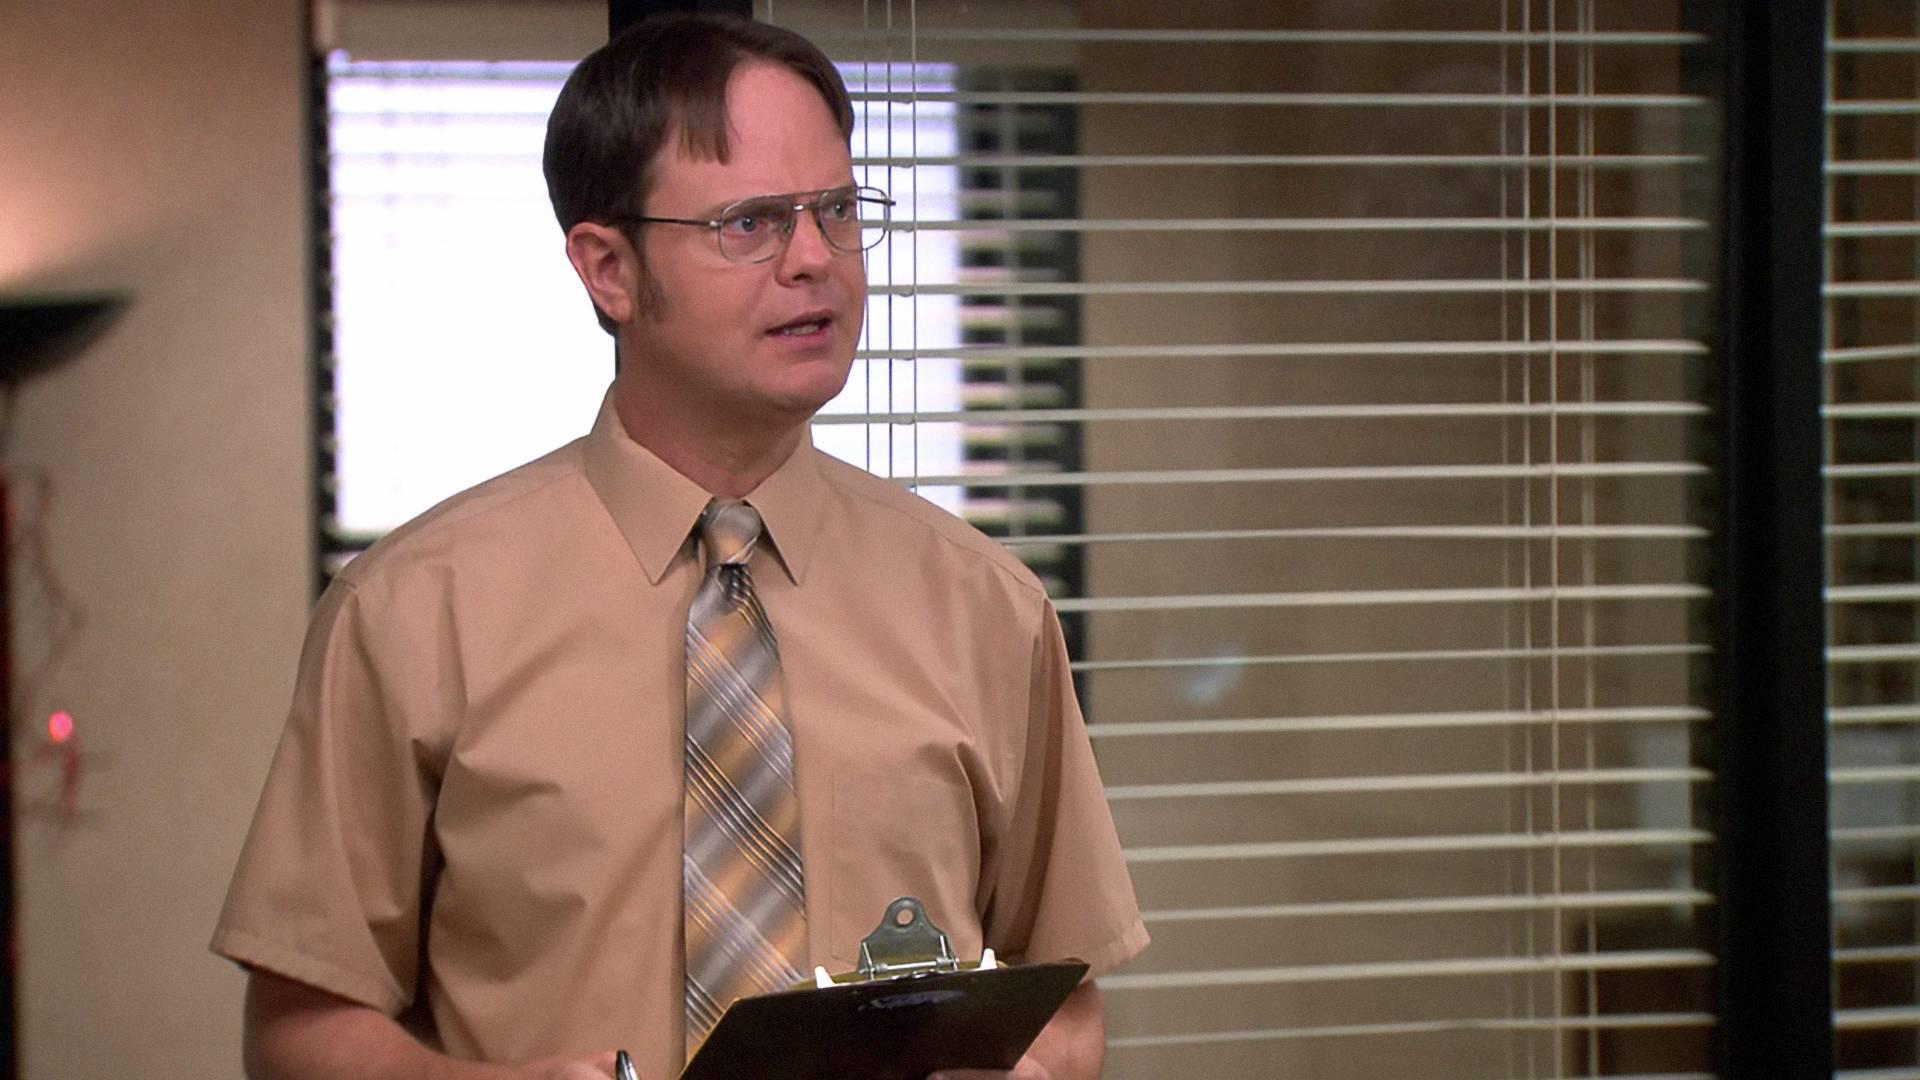 The Office Season 8 Episode 14